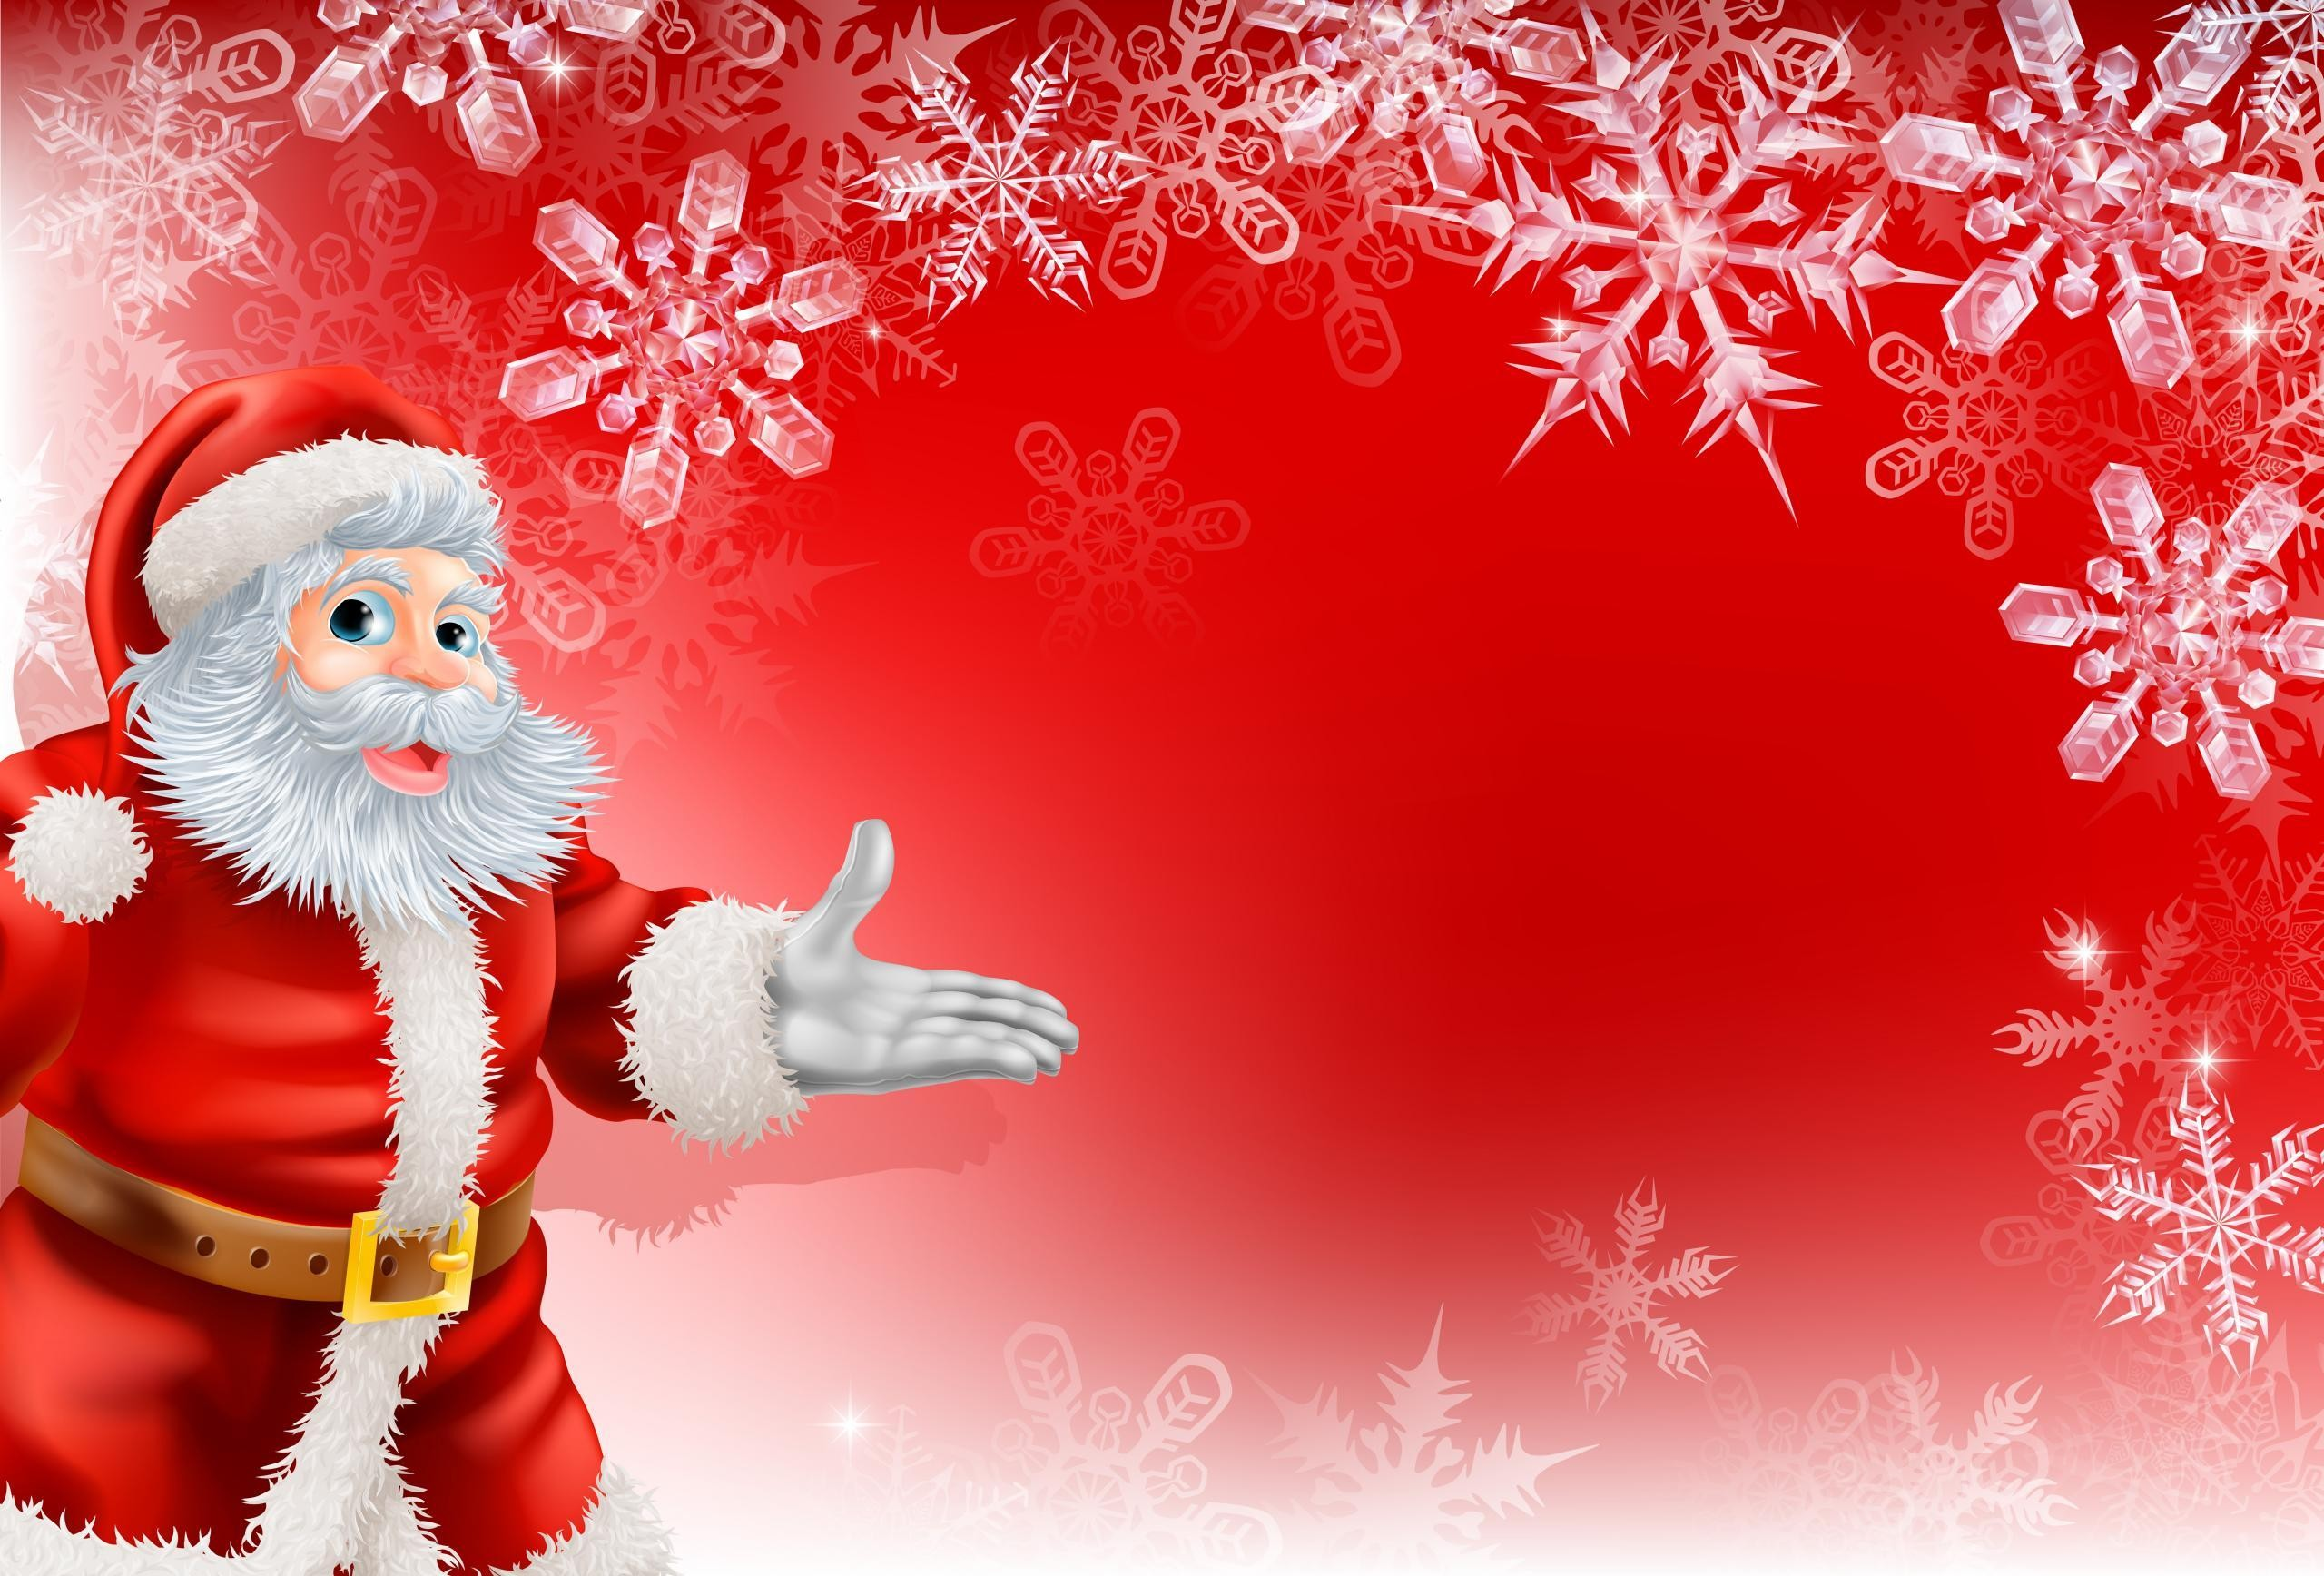 Santa Wallpaper ① Download Free Awesome Backgrounds For Desktop